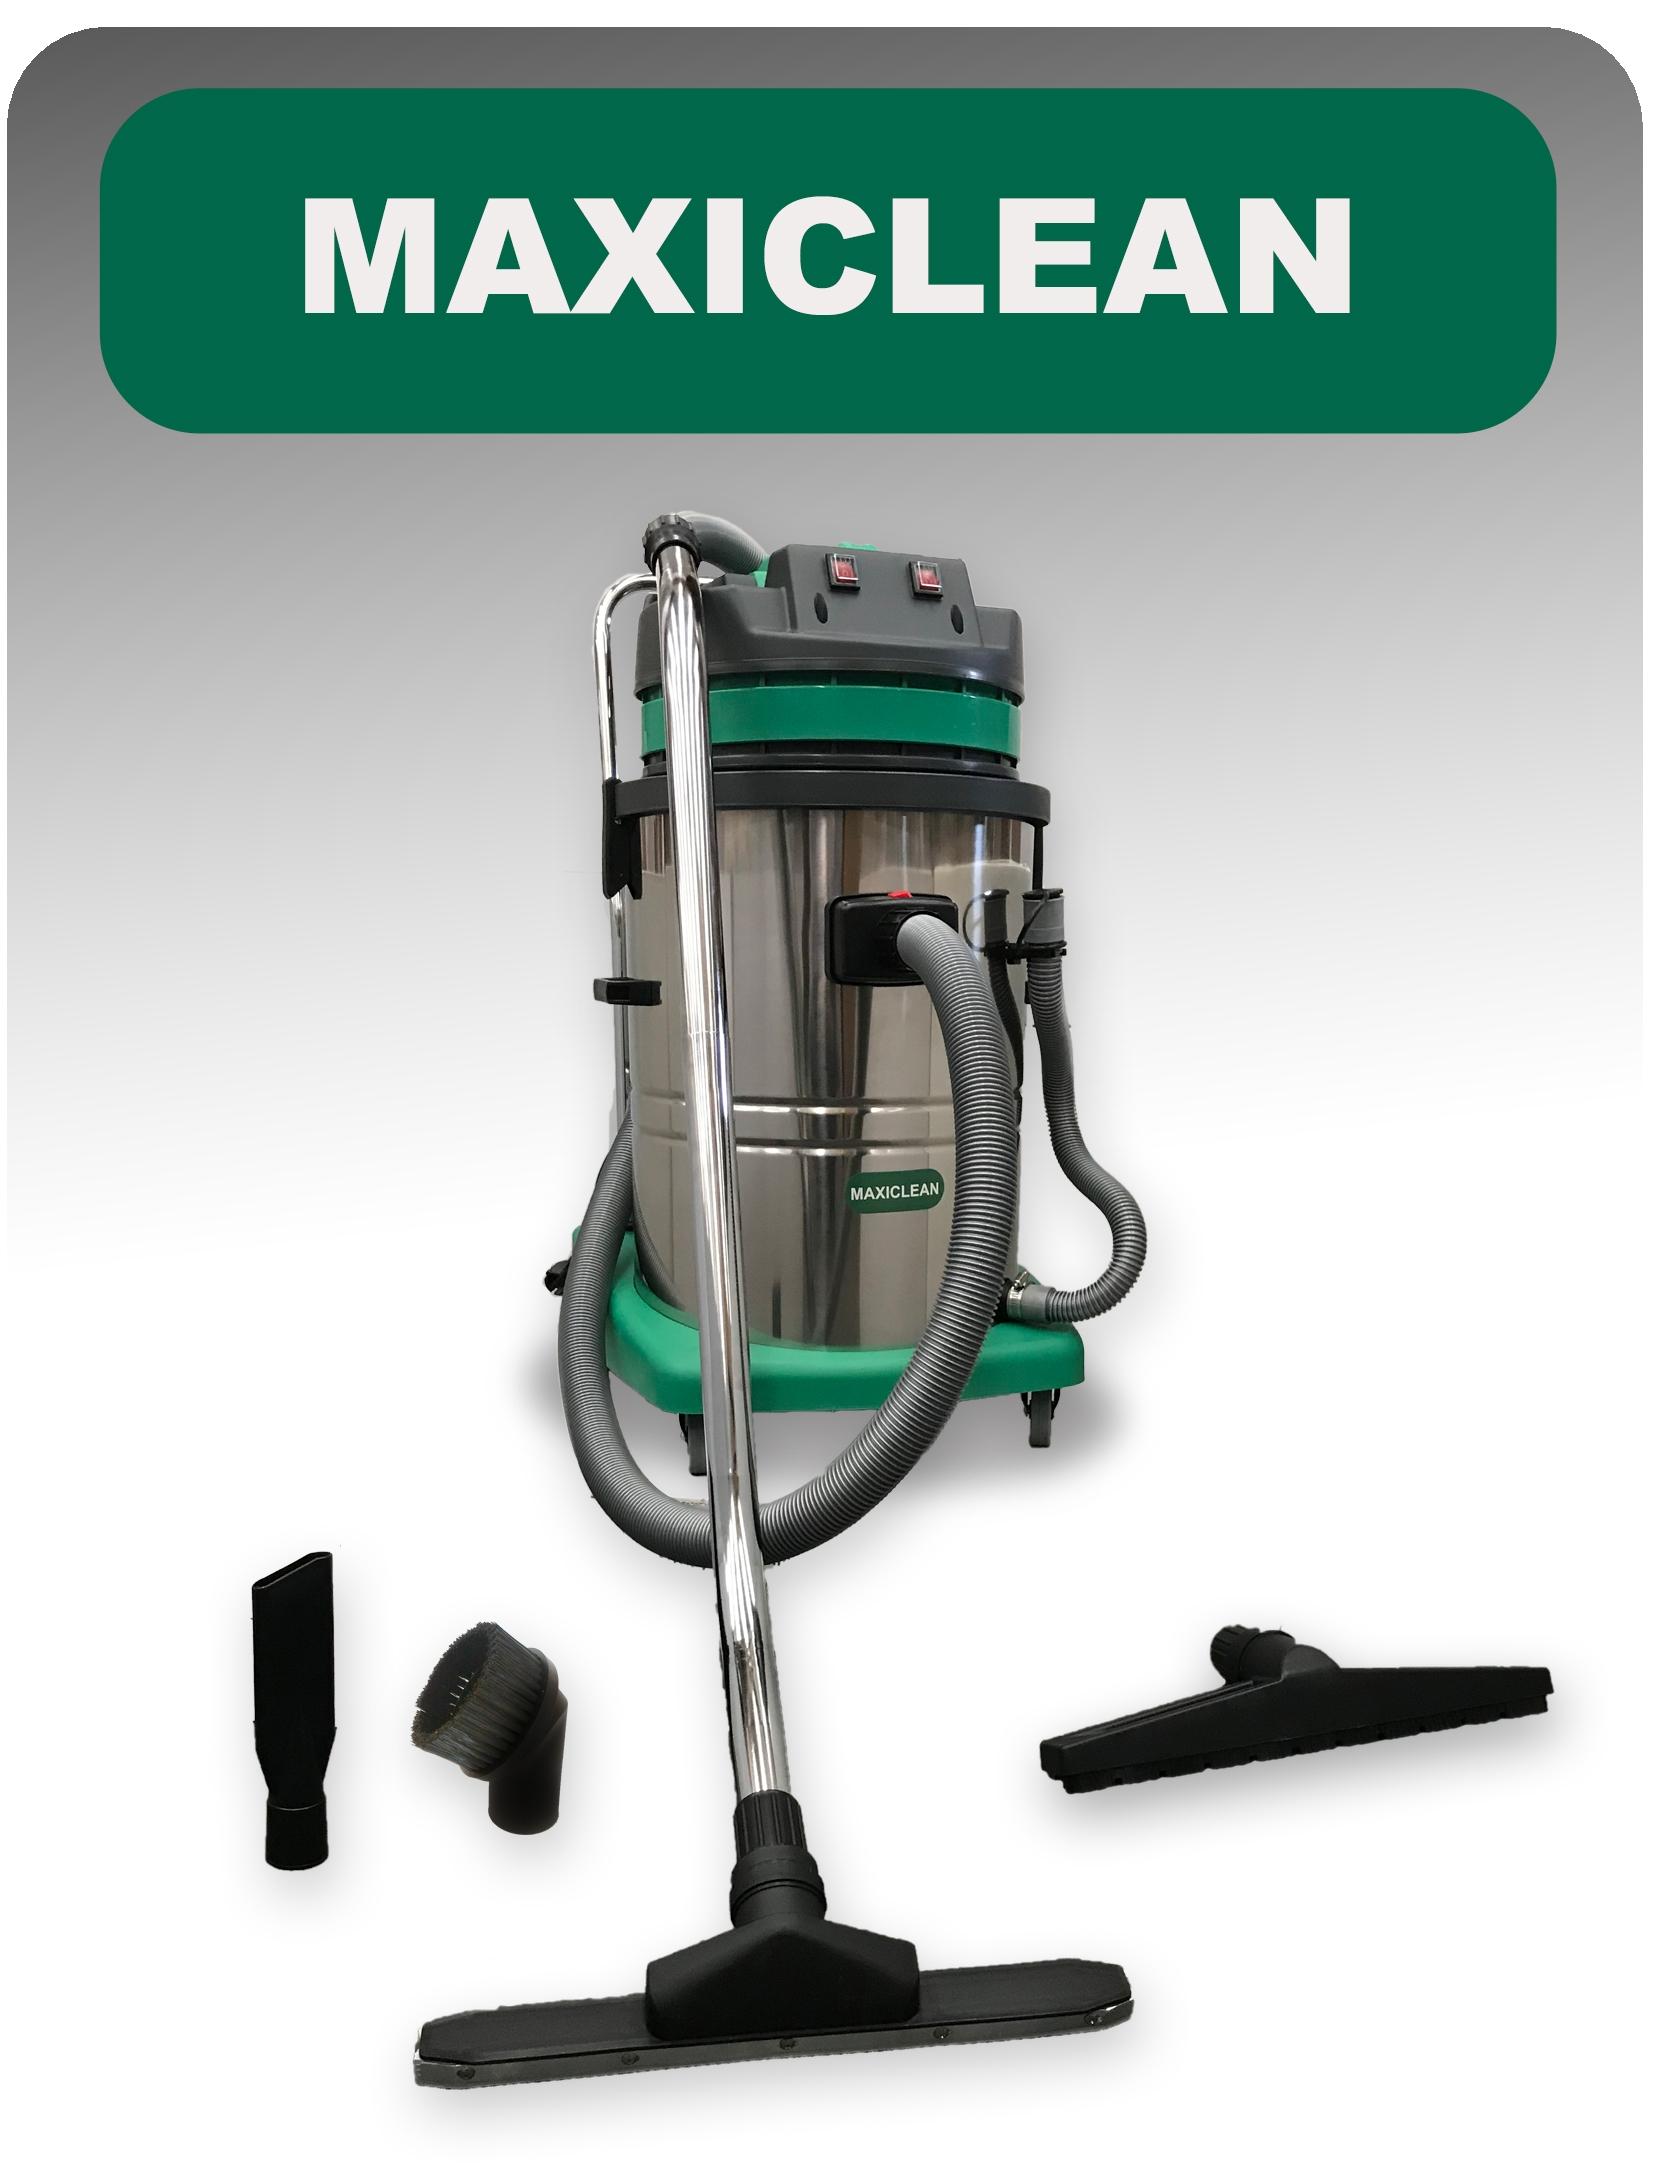 Aspiradores en seco/húmedo BASIC 2000 Watt Industriale para uso Professionale con tubo scarico e due motori Mod: CB60L MAXICLEAN